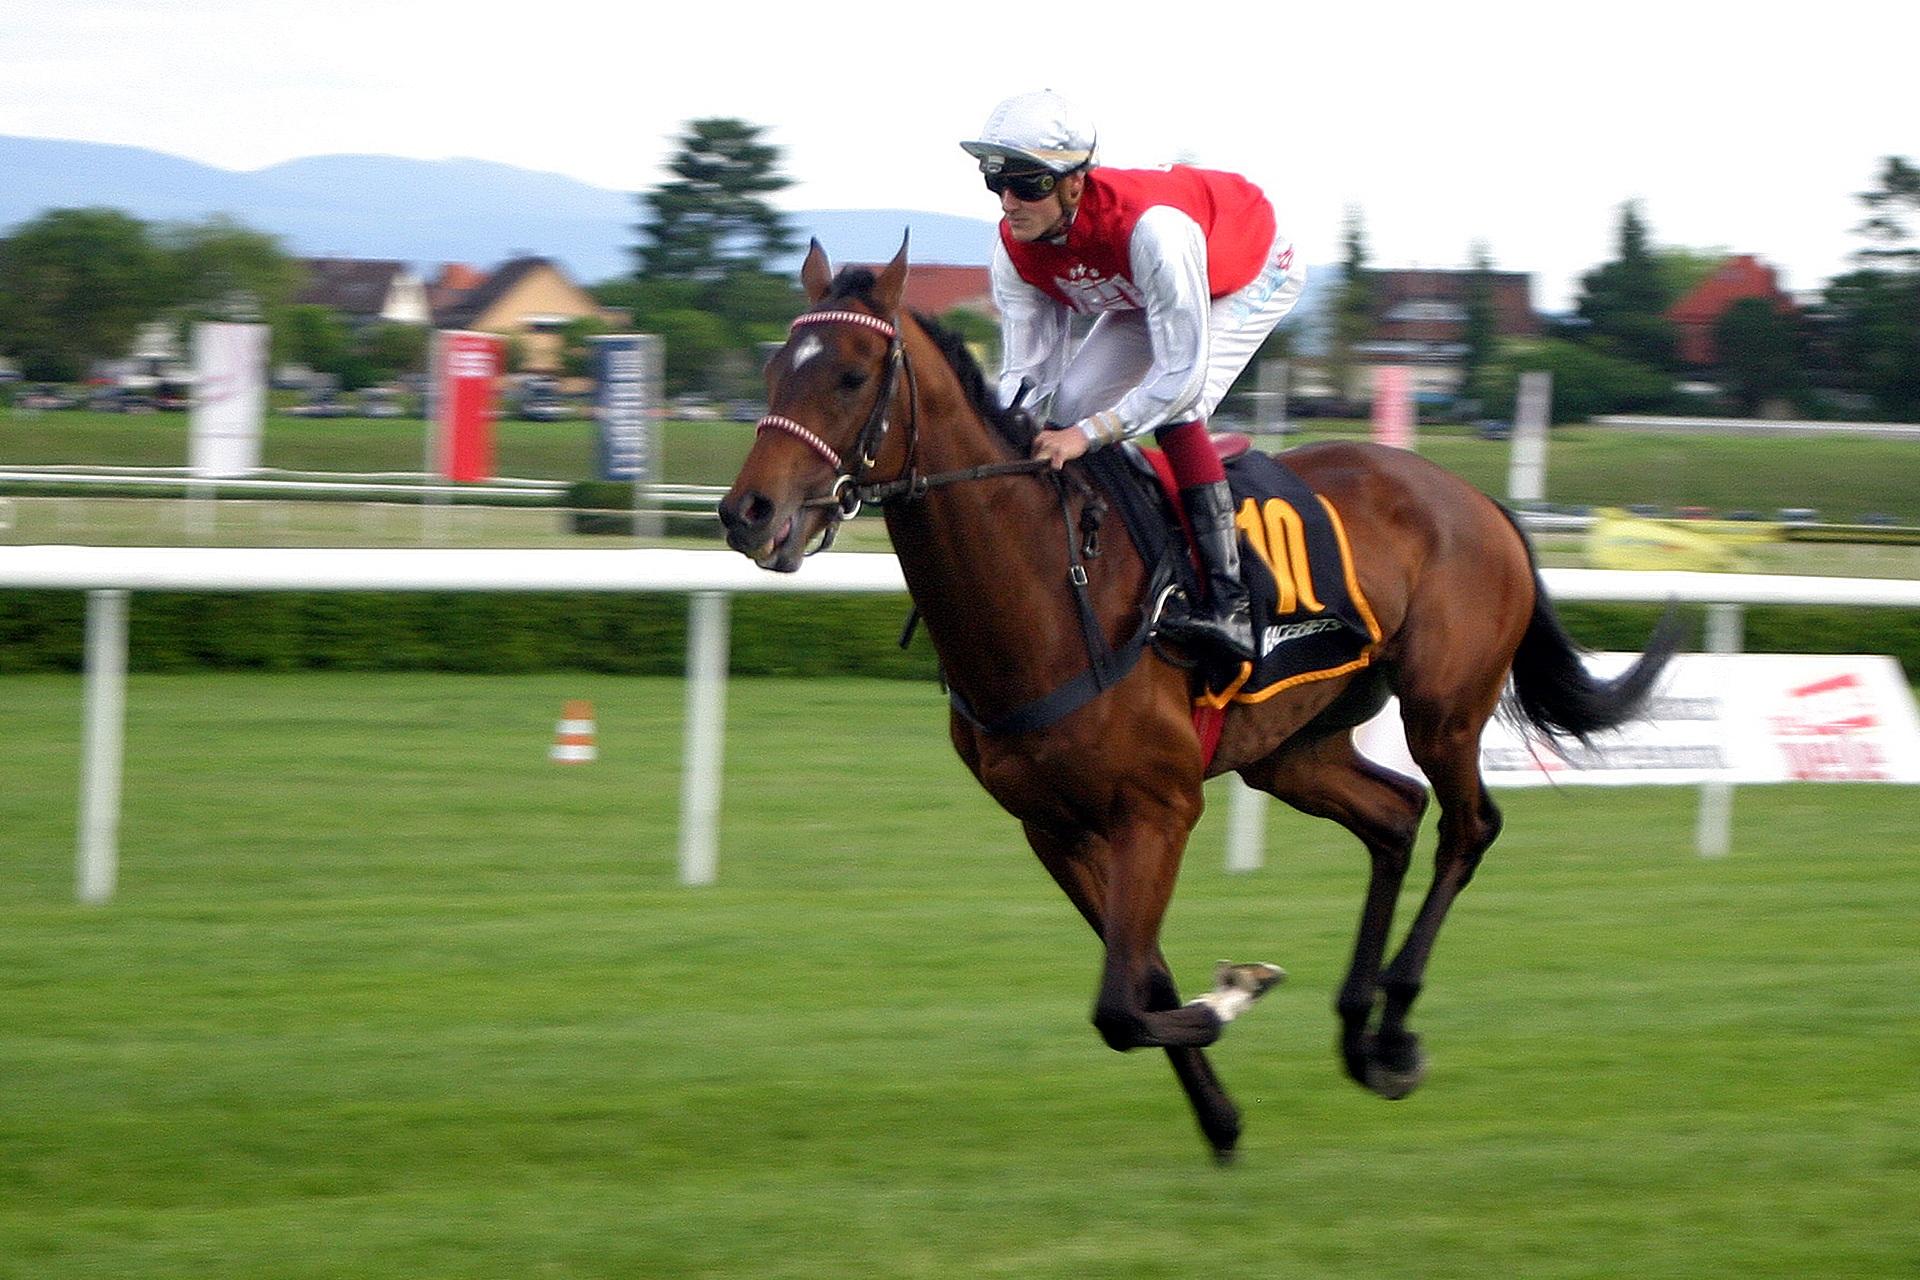 horse-racing-2714849